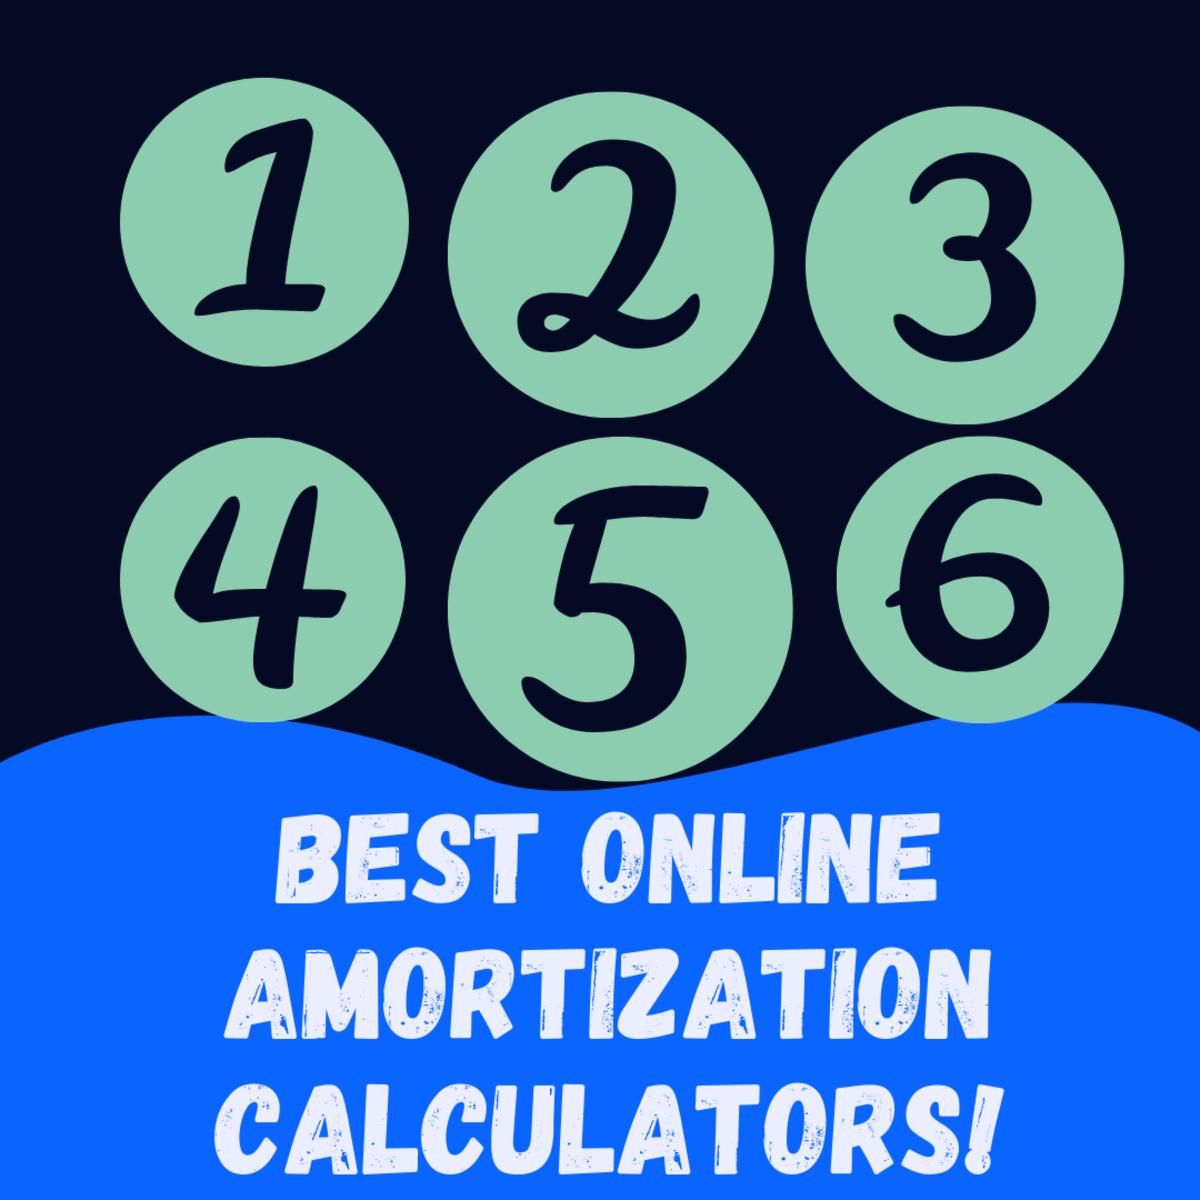 Best Online Amortization Calculators